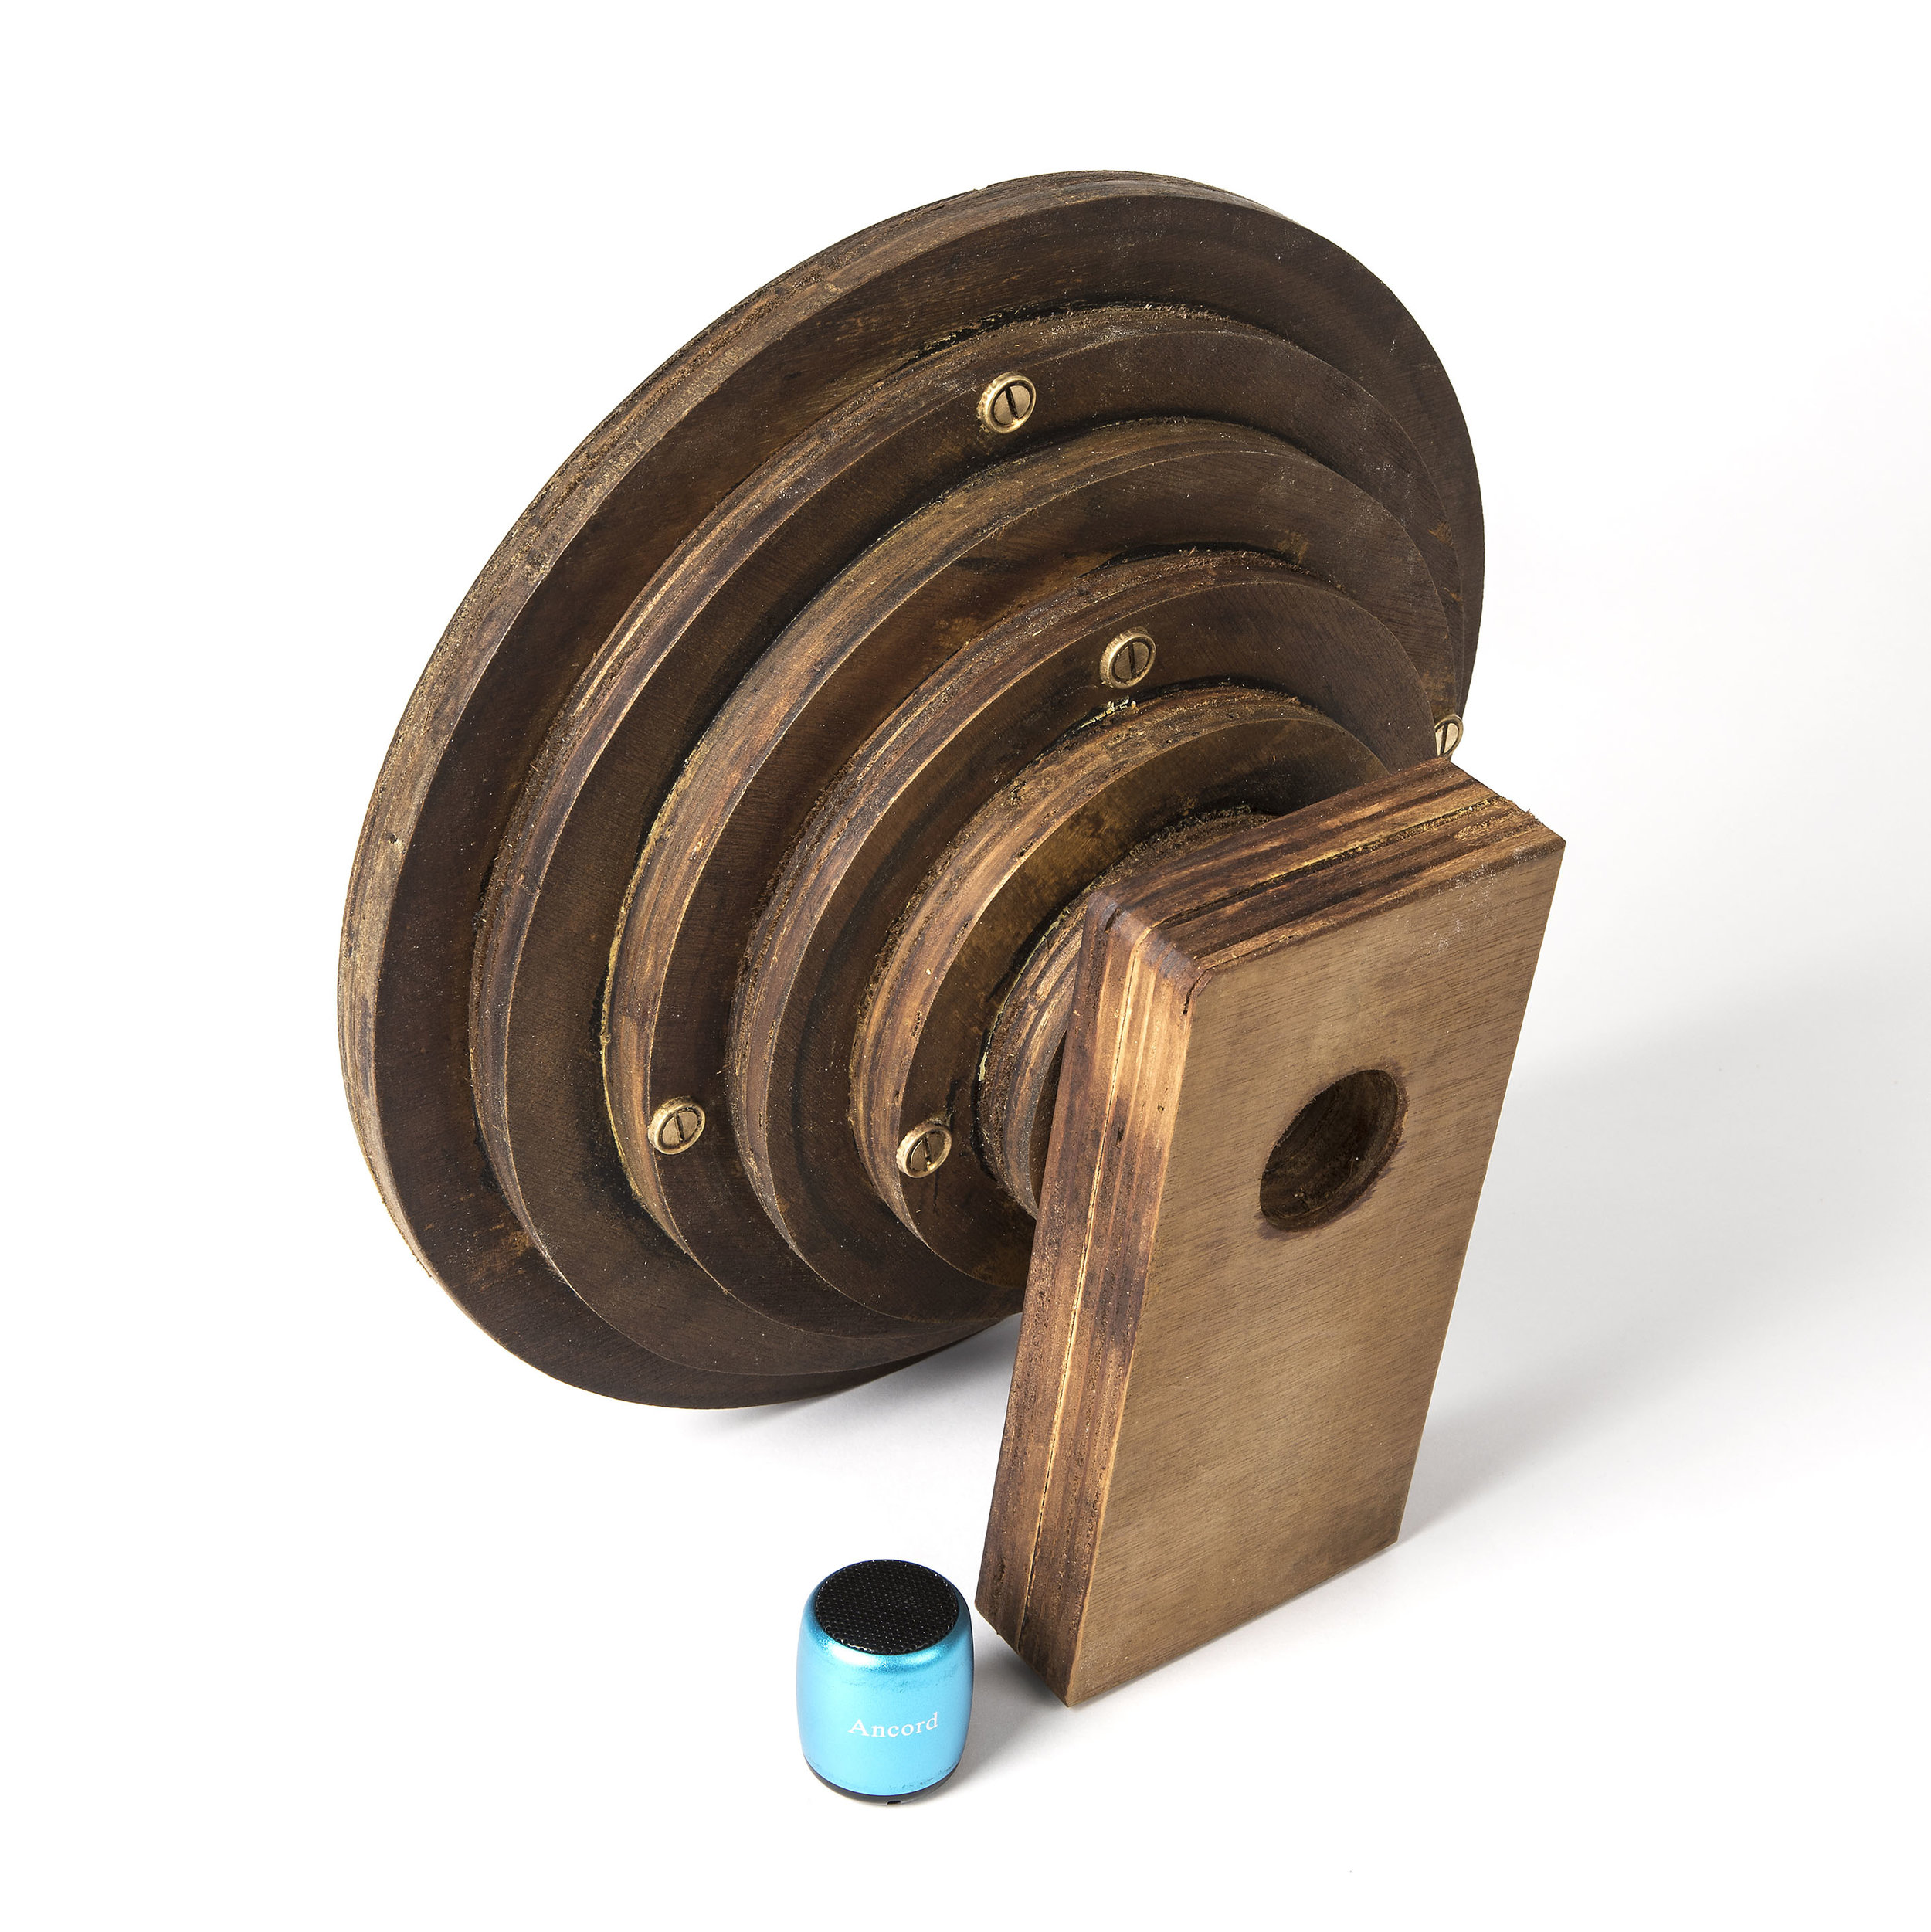 The medium speaker [rear view]